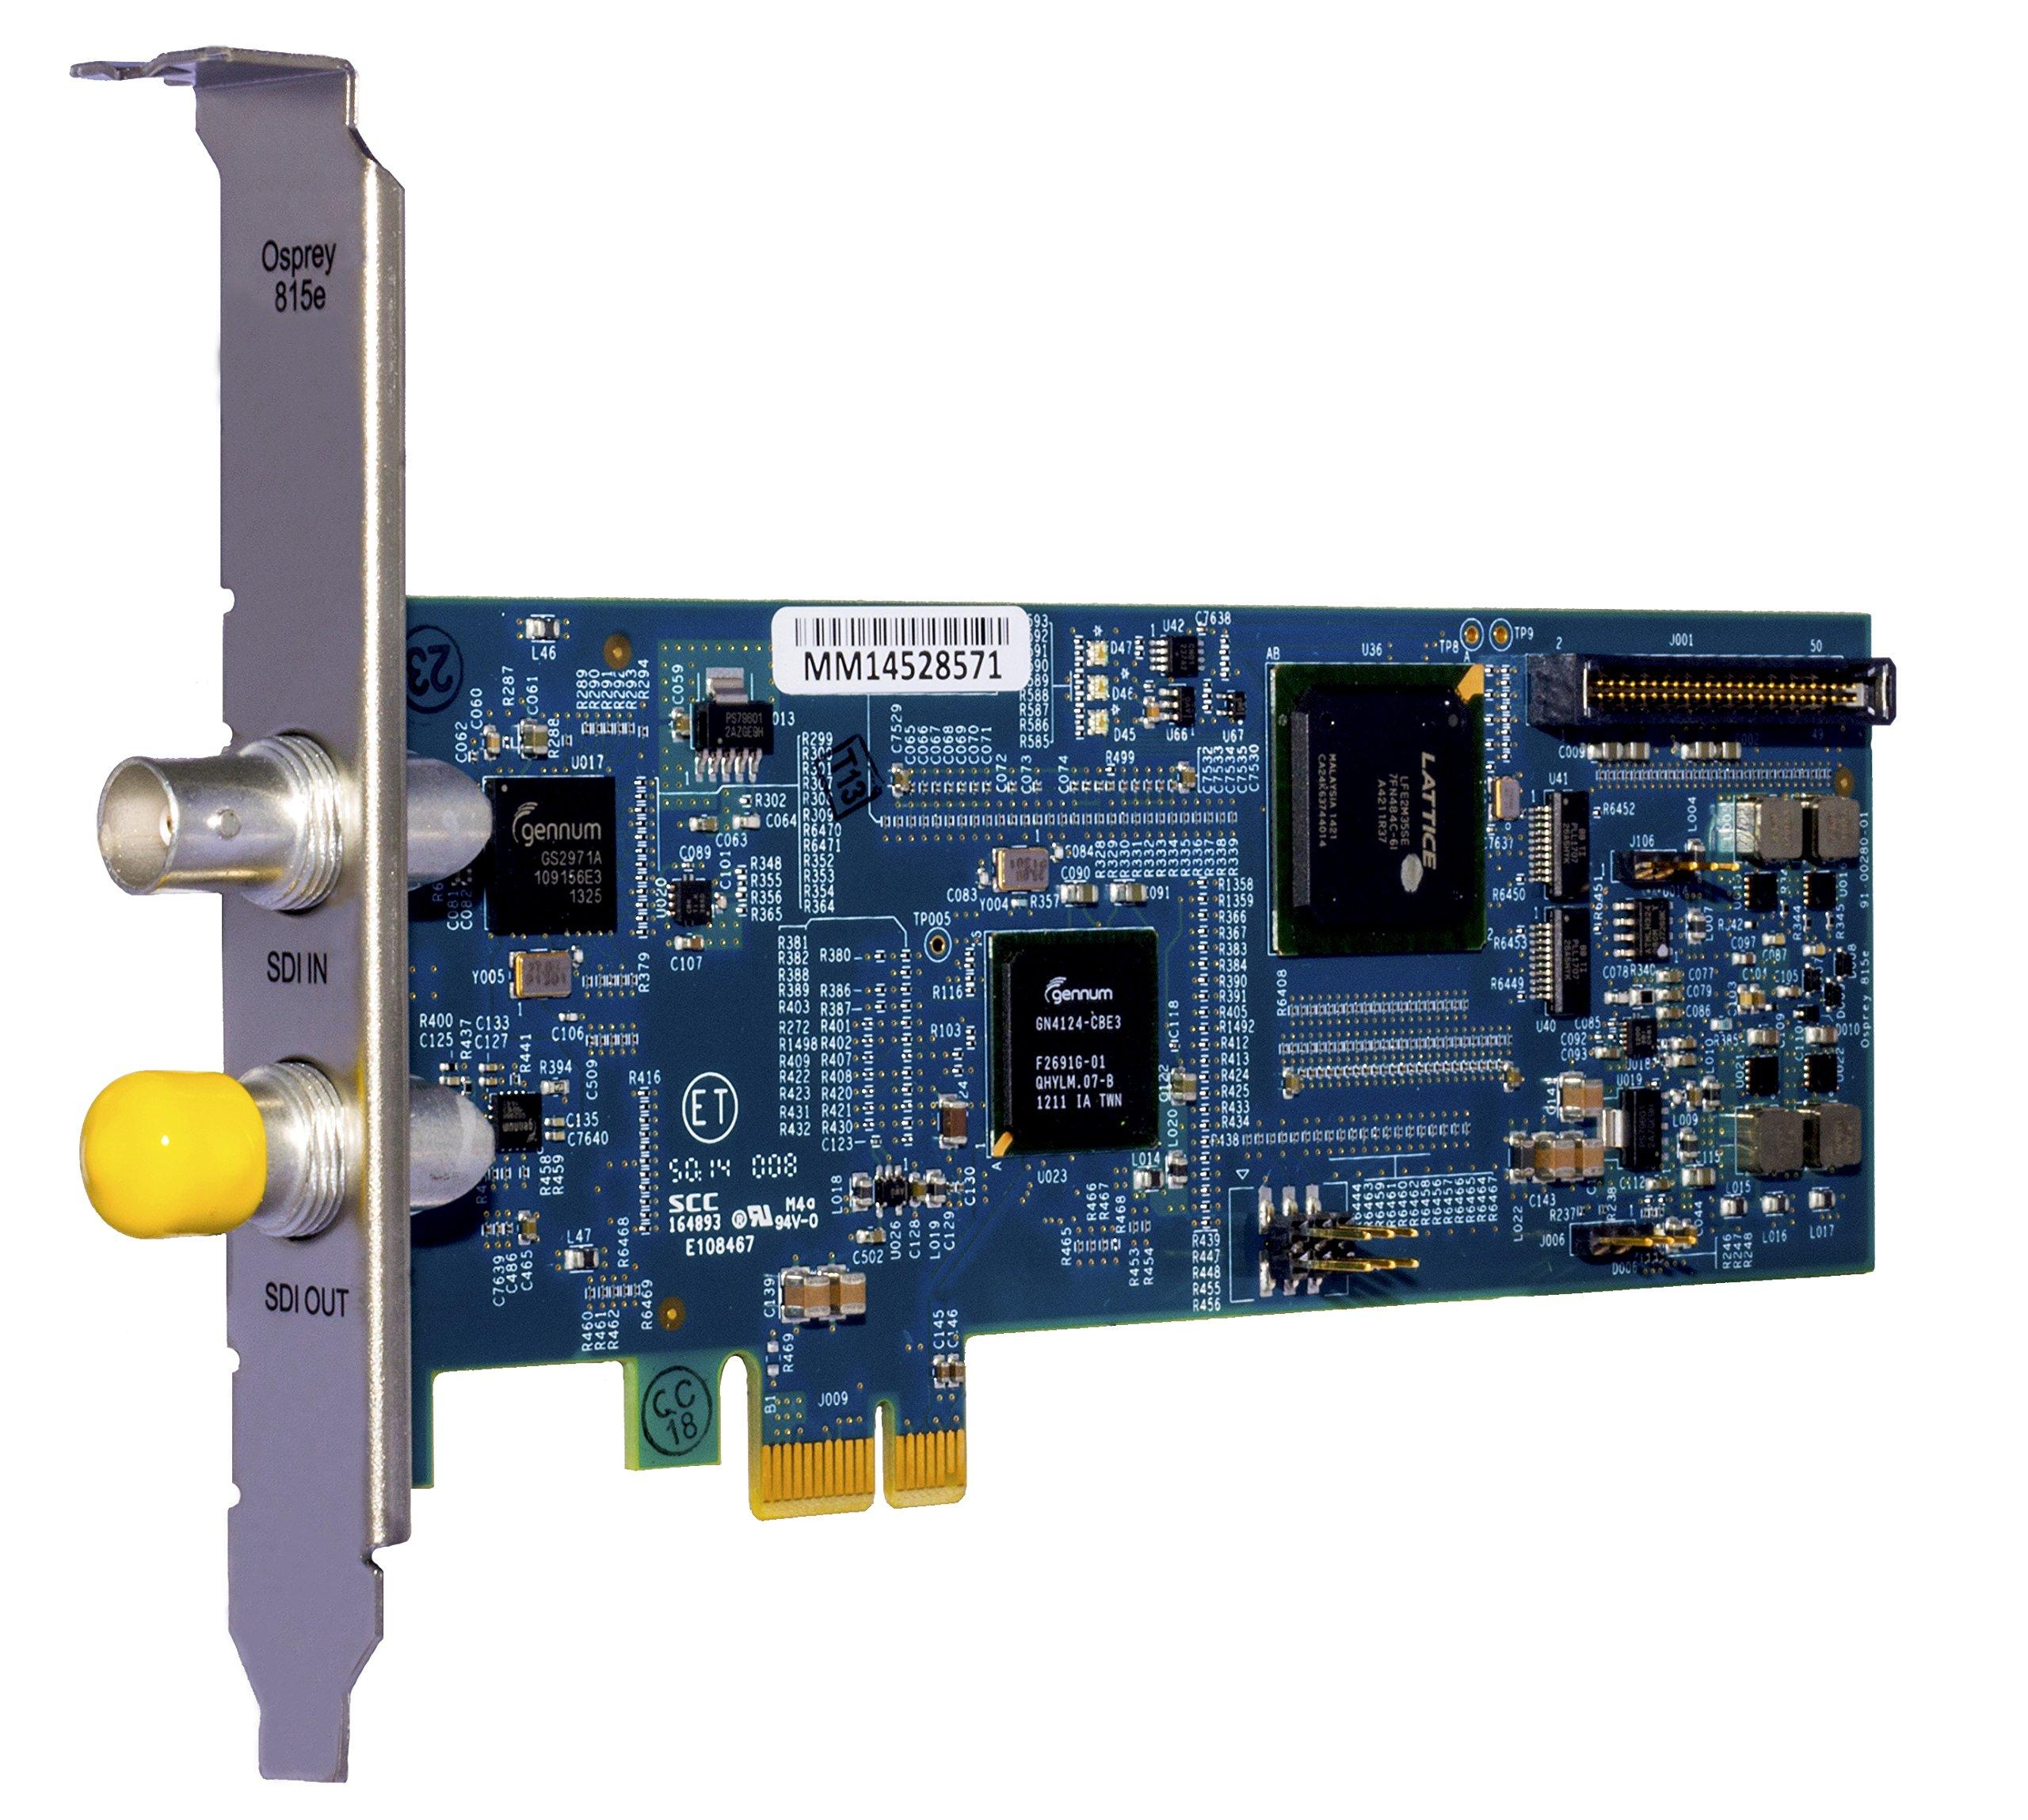 Osprey Video 815e HD SDI Video Capture Card by Osprey Video